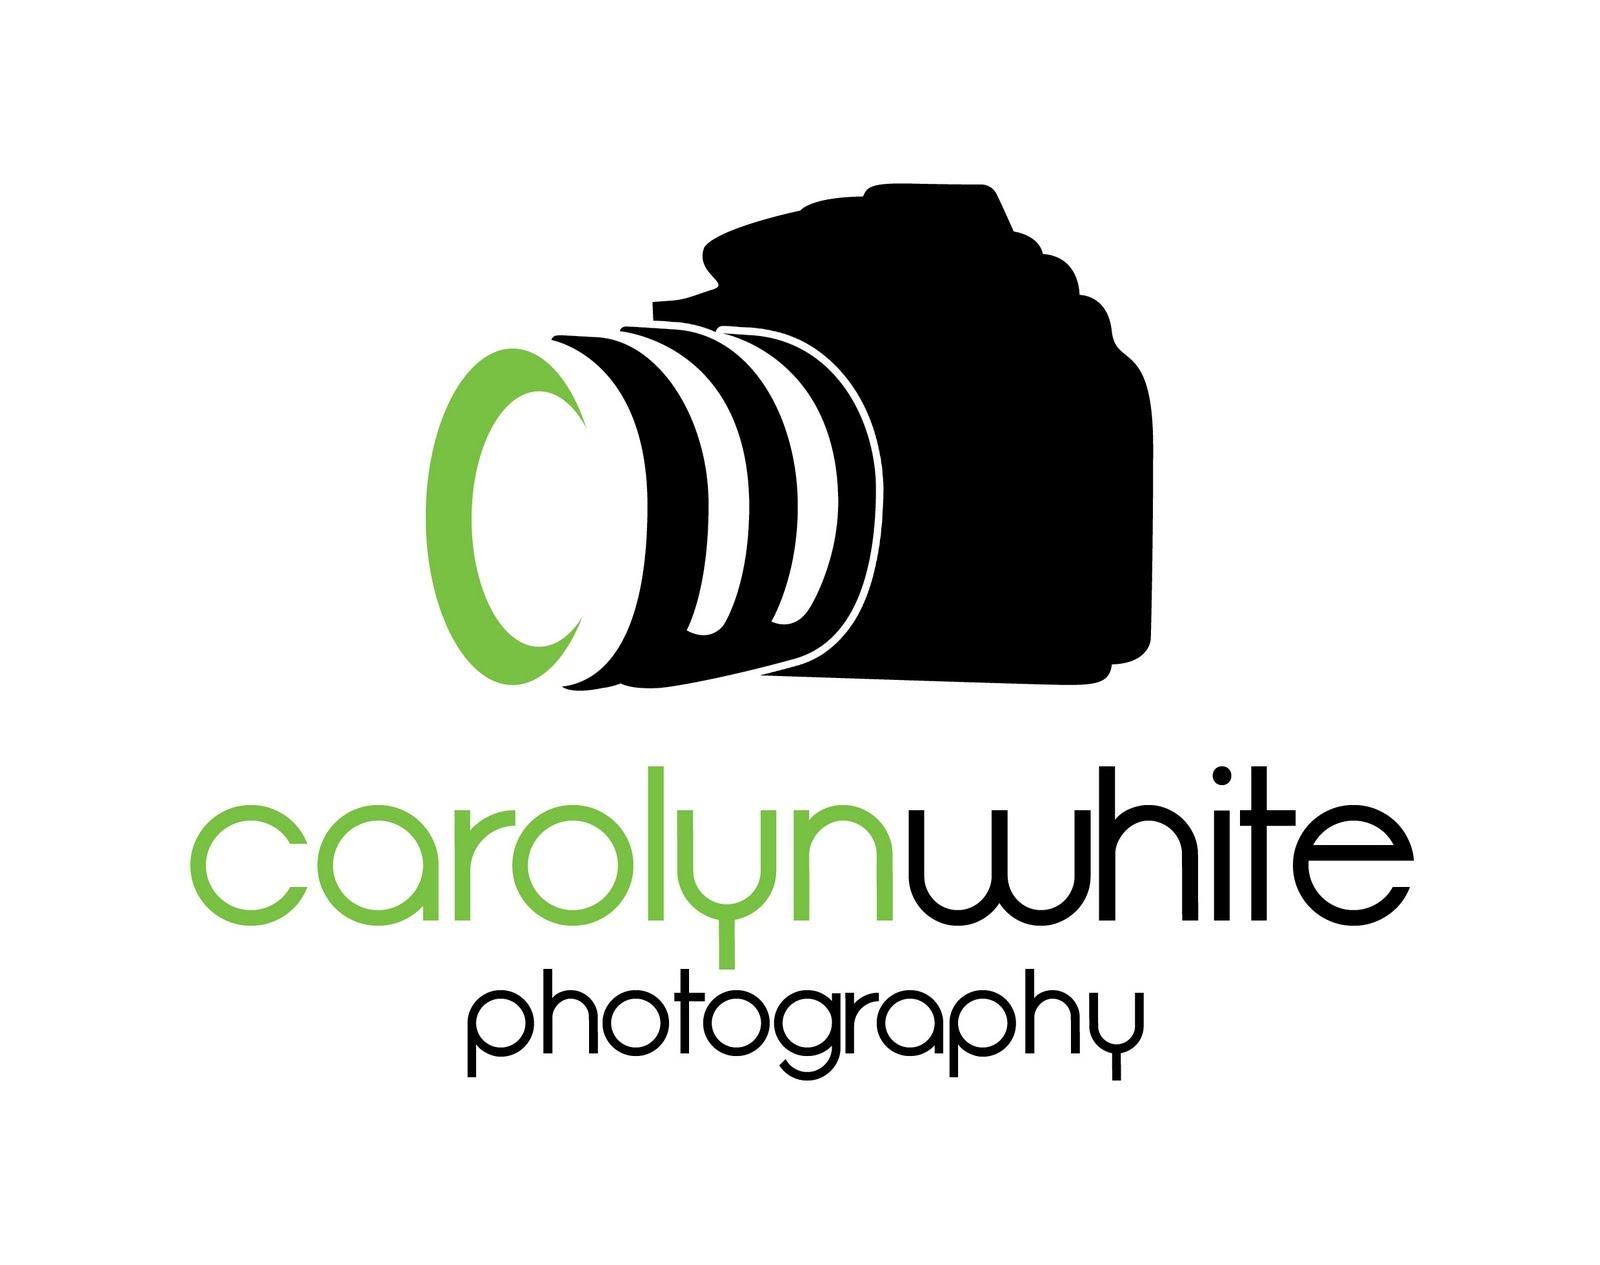 Photography Logo Ideas Carolyn white photography: